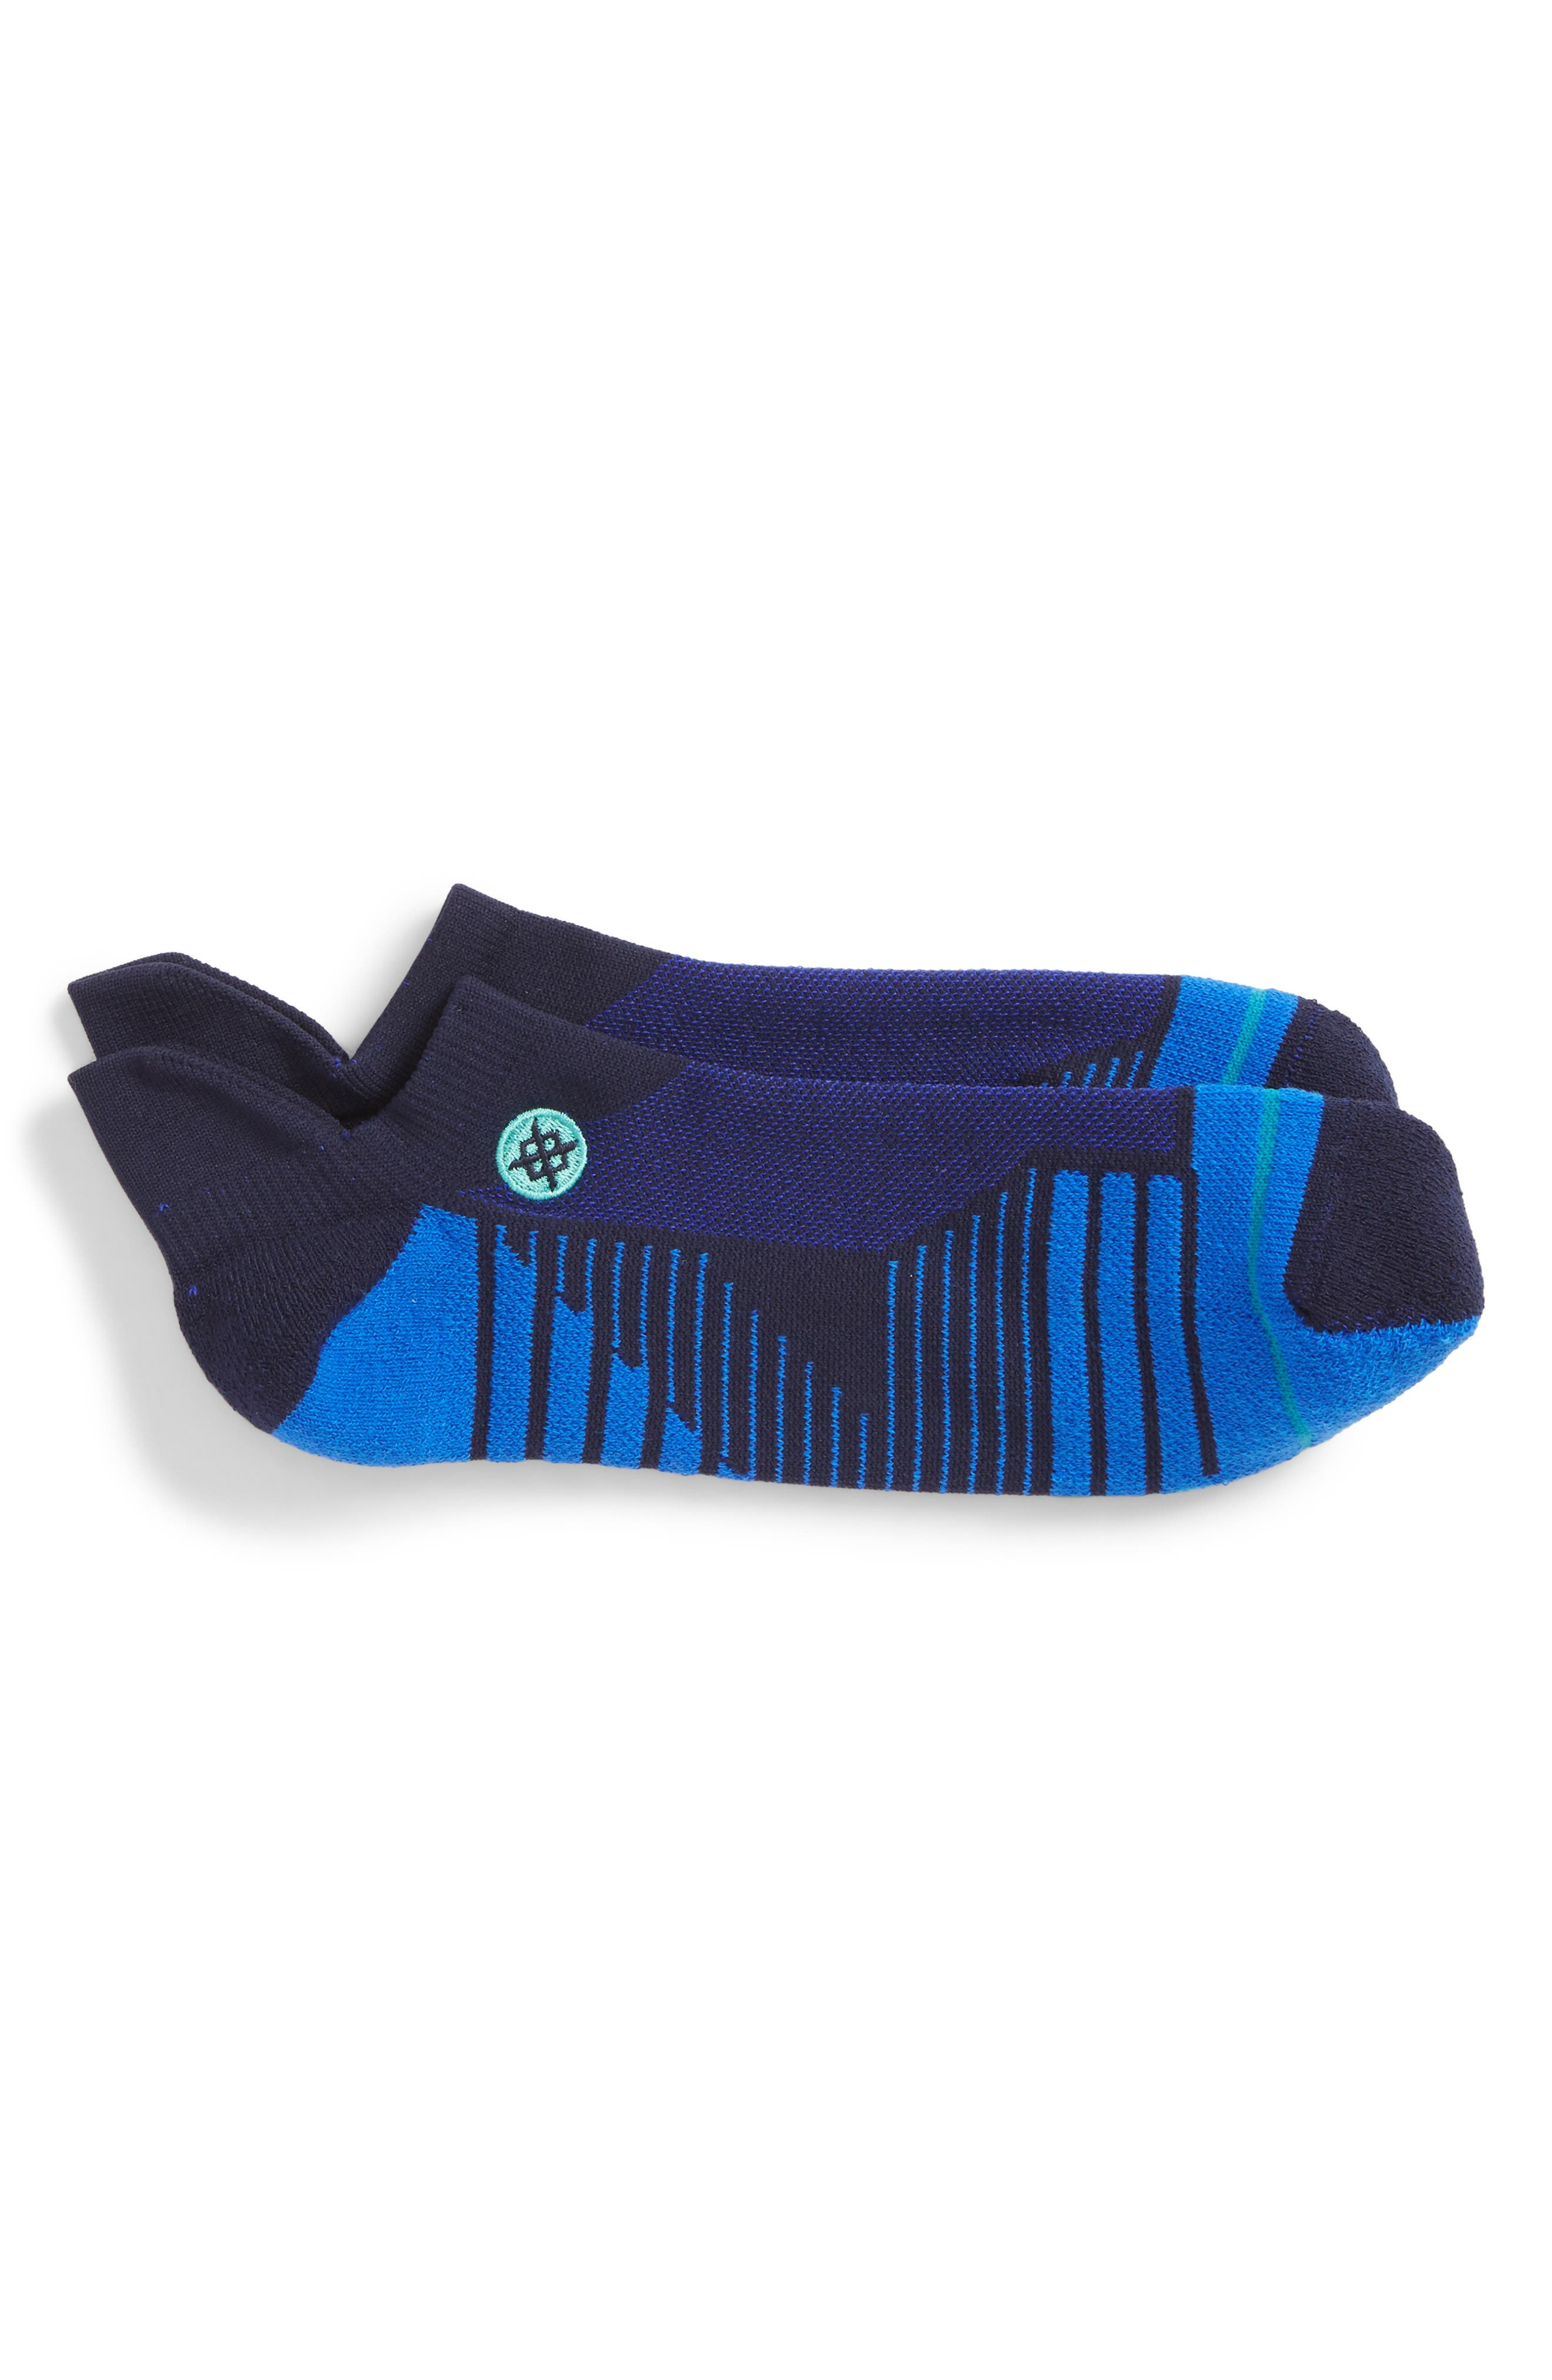 High Regard Tab Socks,                             Main thumbnail 1, color,                             Navy